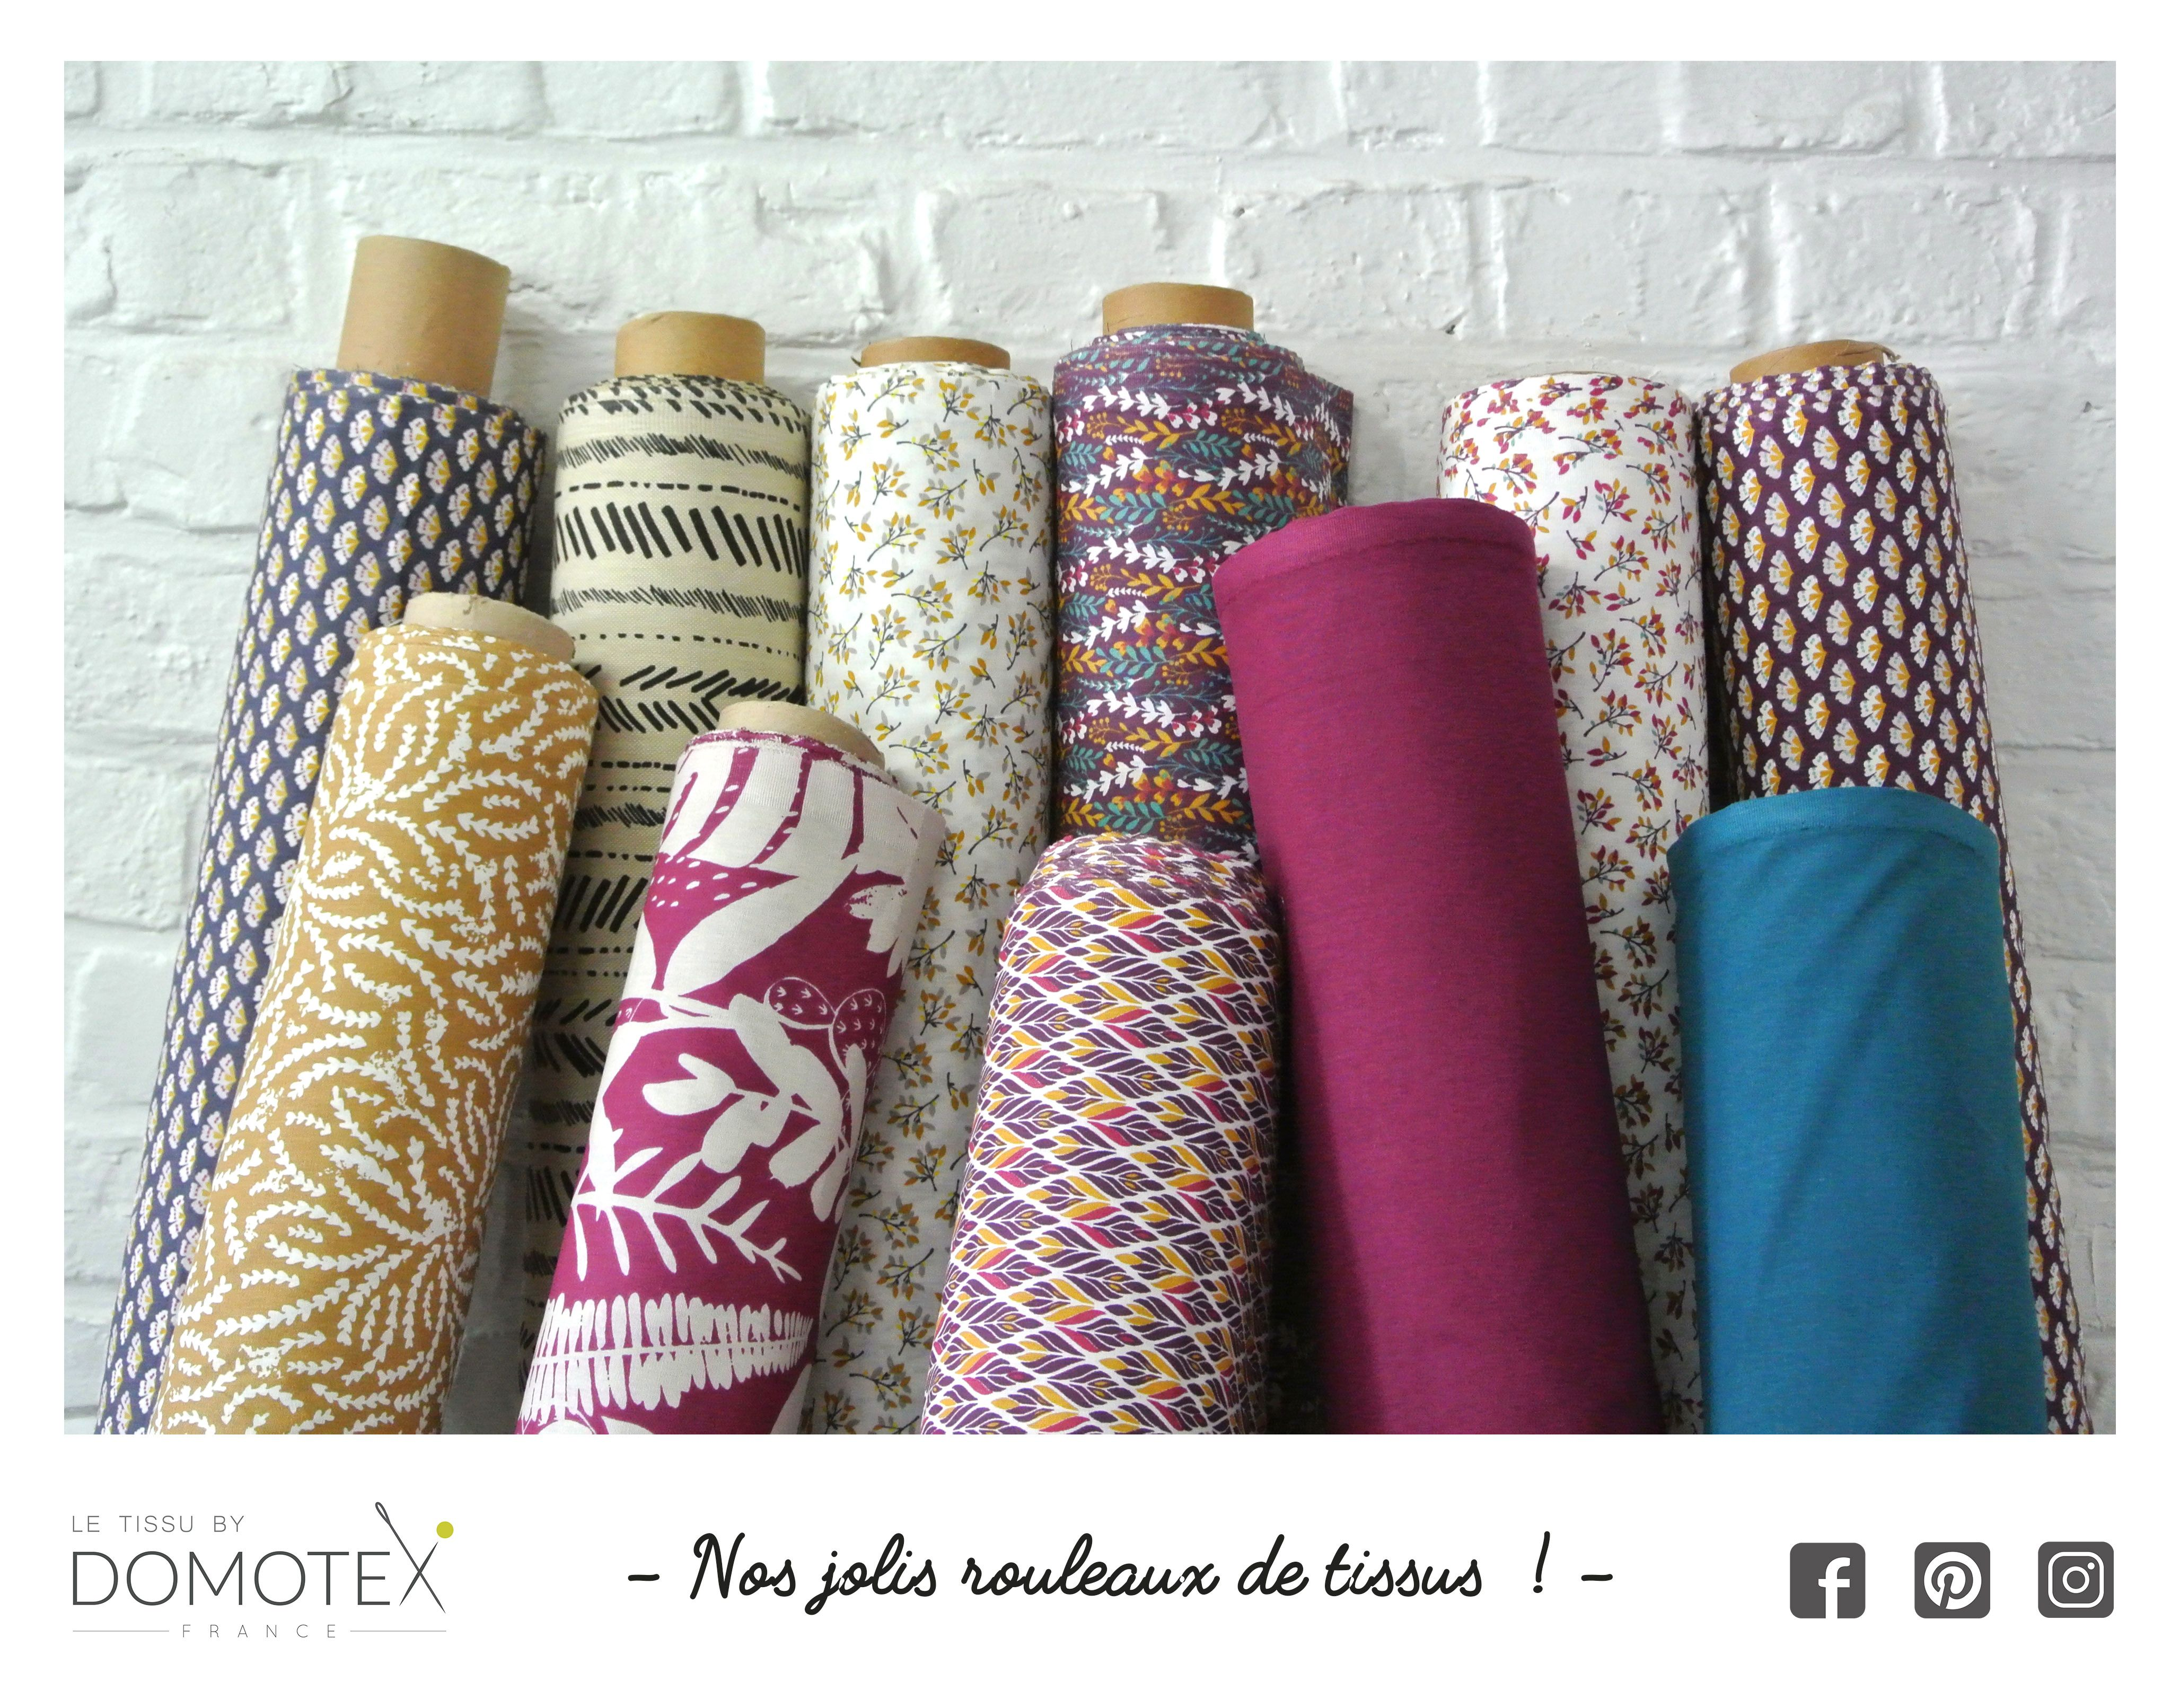 Nouveautes Rouleaux De Tissus Tissu Tissus Idee Couture